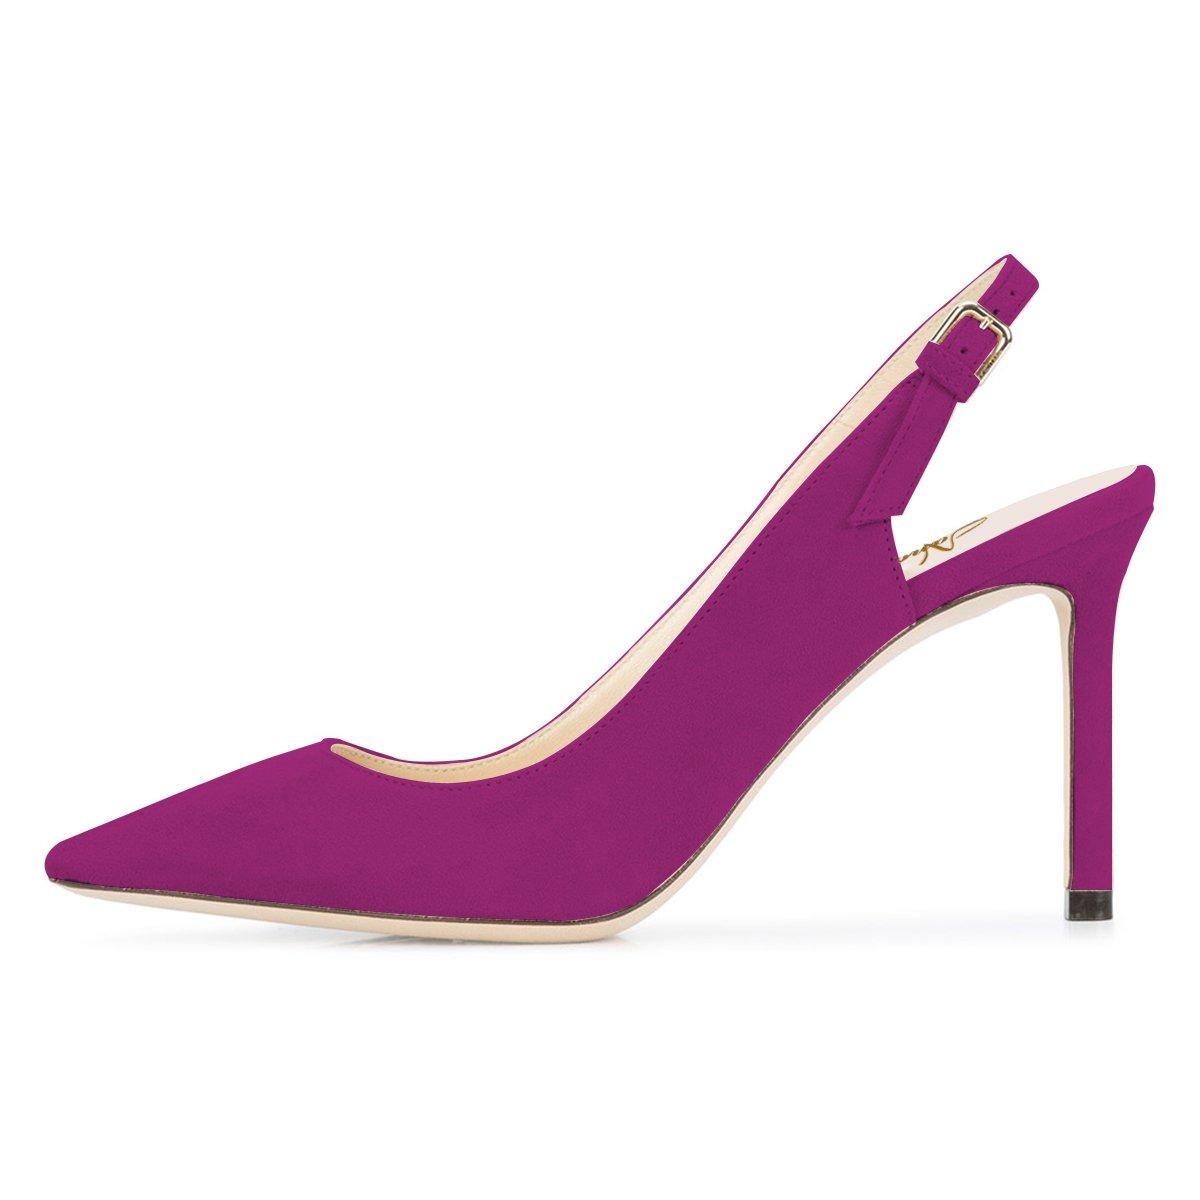 13a3117de63 ... NJPU Women Women Women Pointed Toe Slingback Pumps Stiletto High Heels  Office Shoes with Buckle B07C2V9BLQ ...